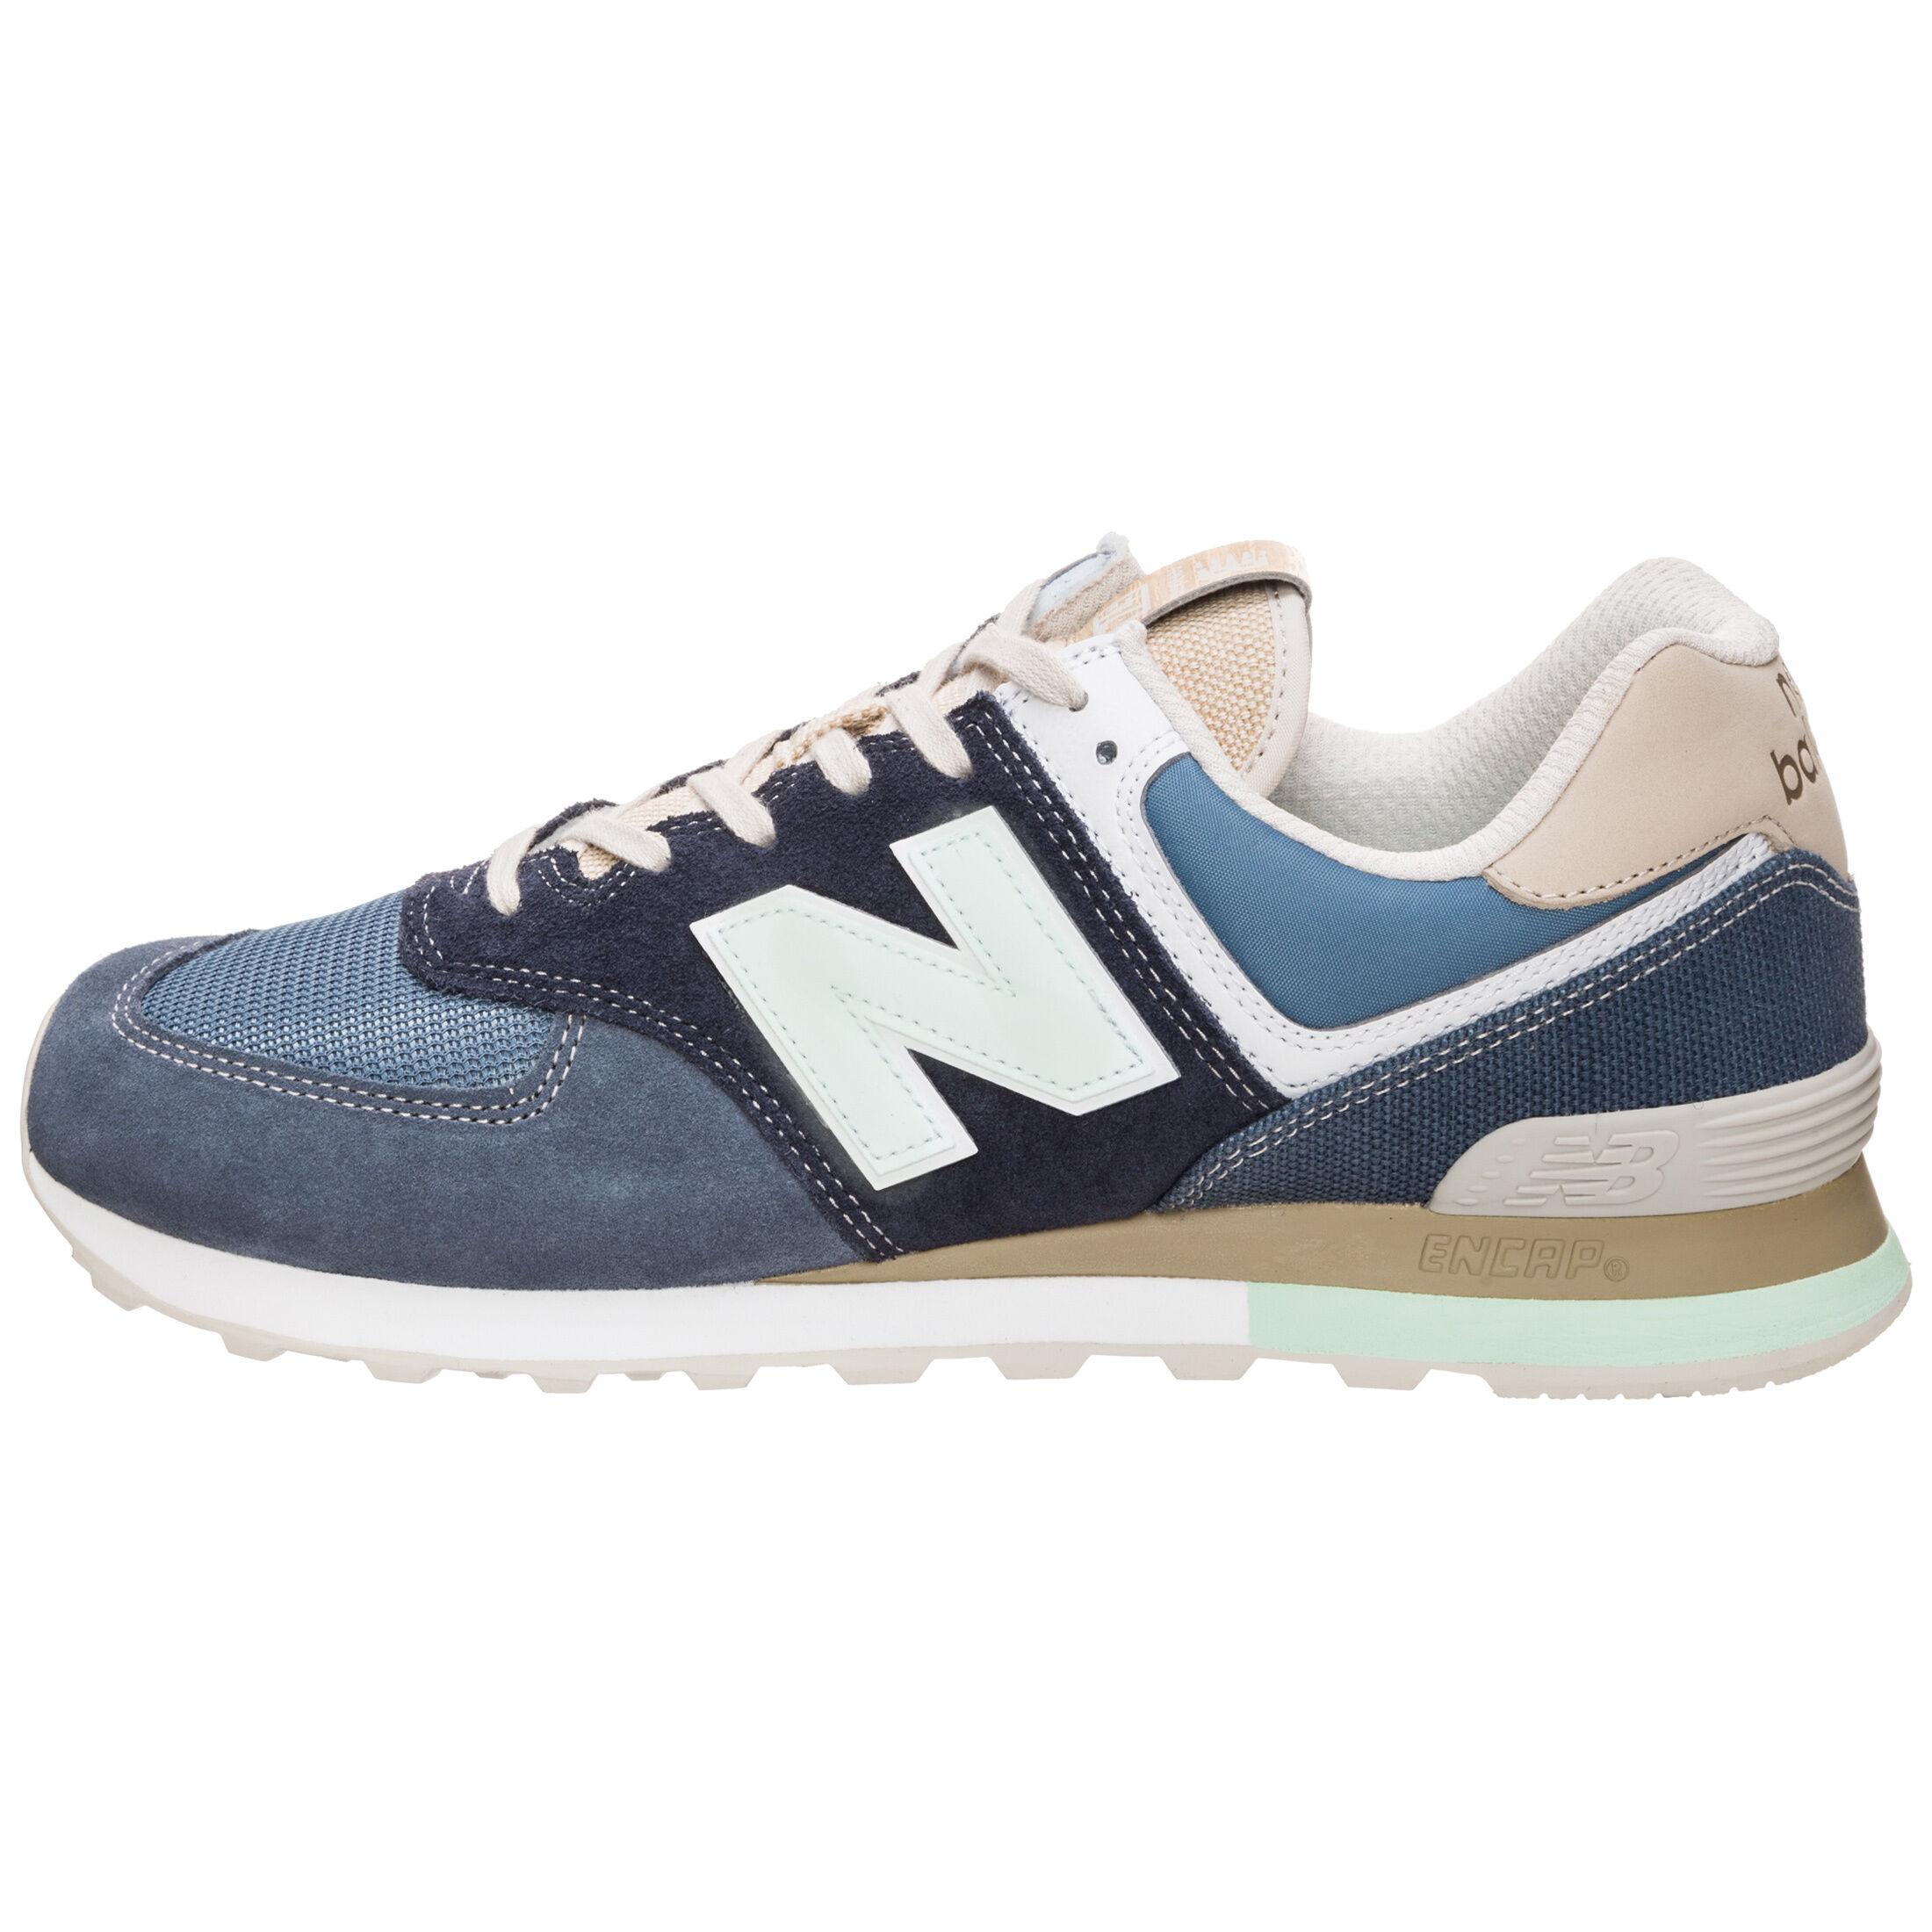 »Ml574-bsl-d« Sneaker, blau, dunkelblau-beige New Balance